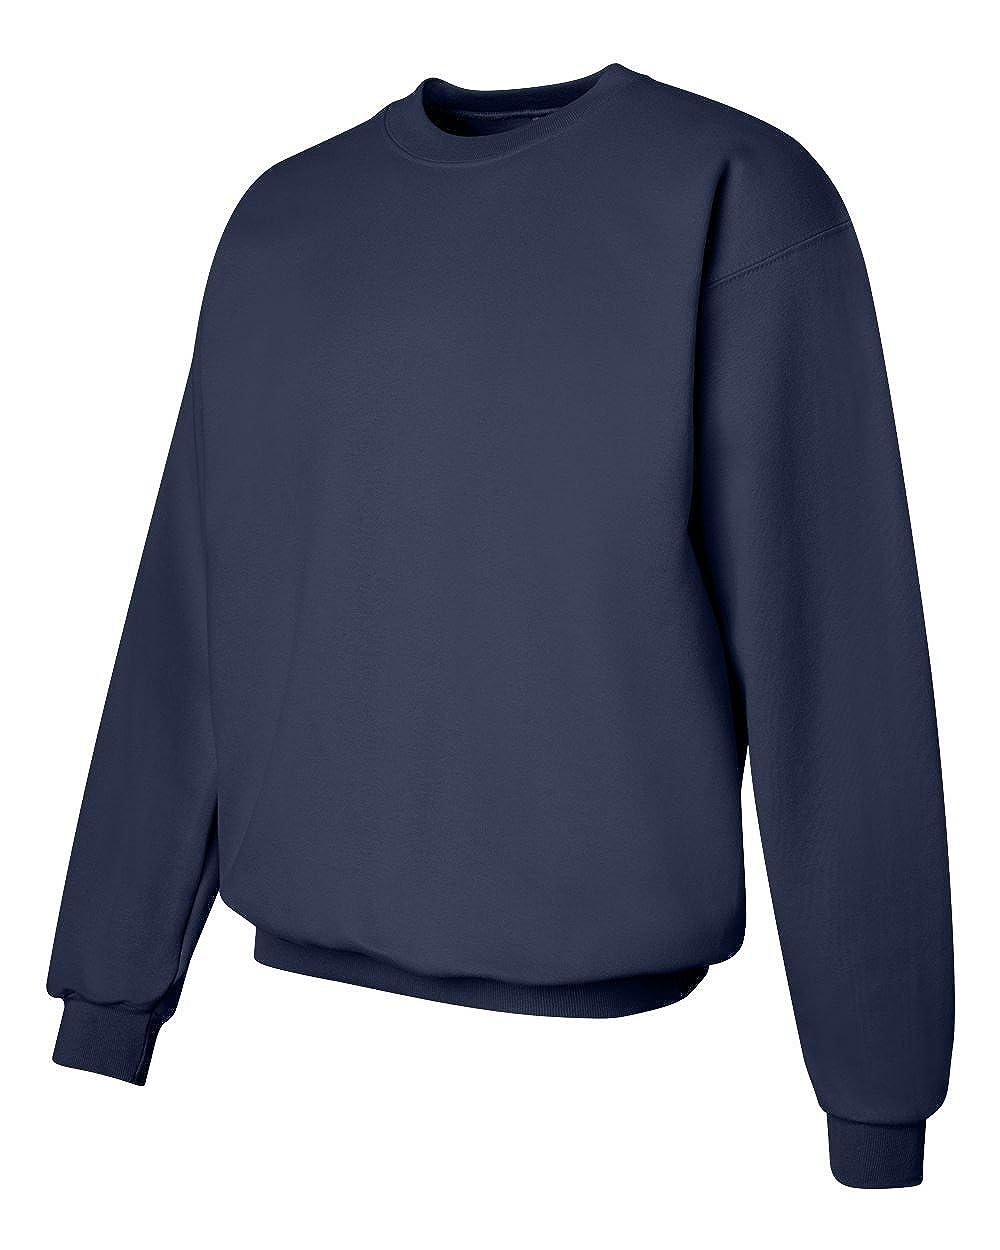 Sweater Set of 2 Hanes Mens Ultimate Cotton Fleece Crew 10 oz